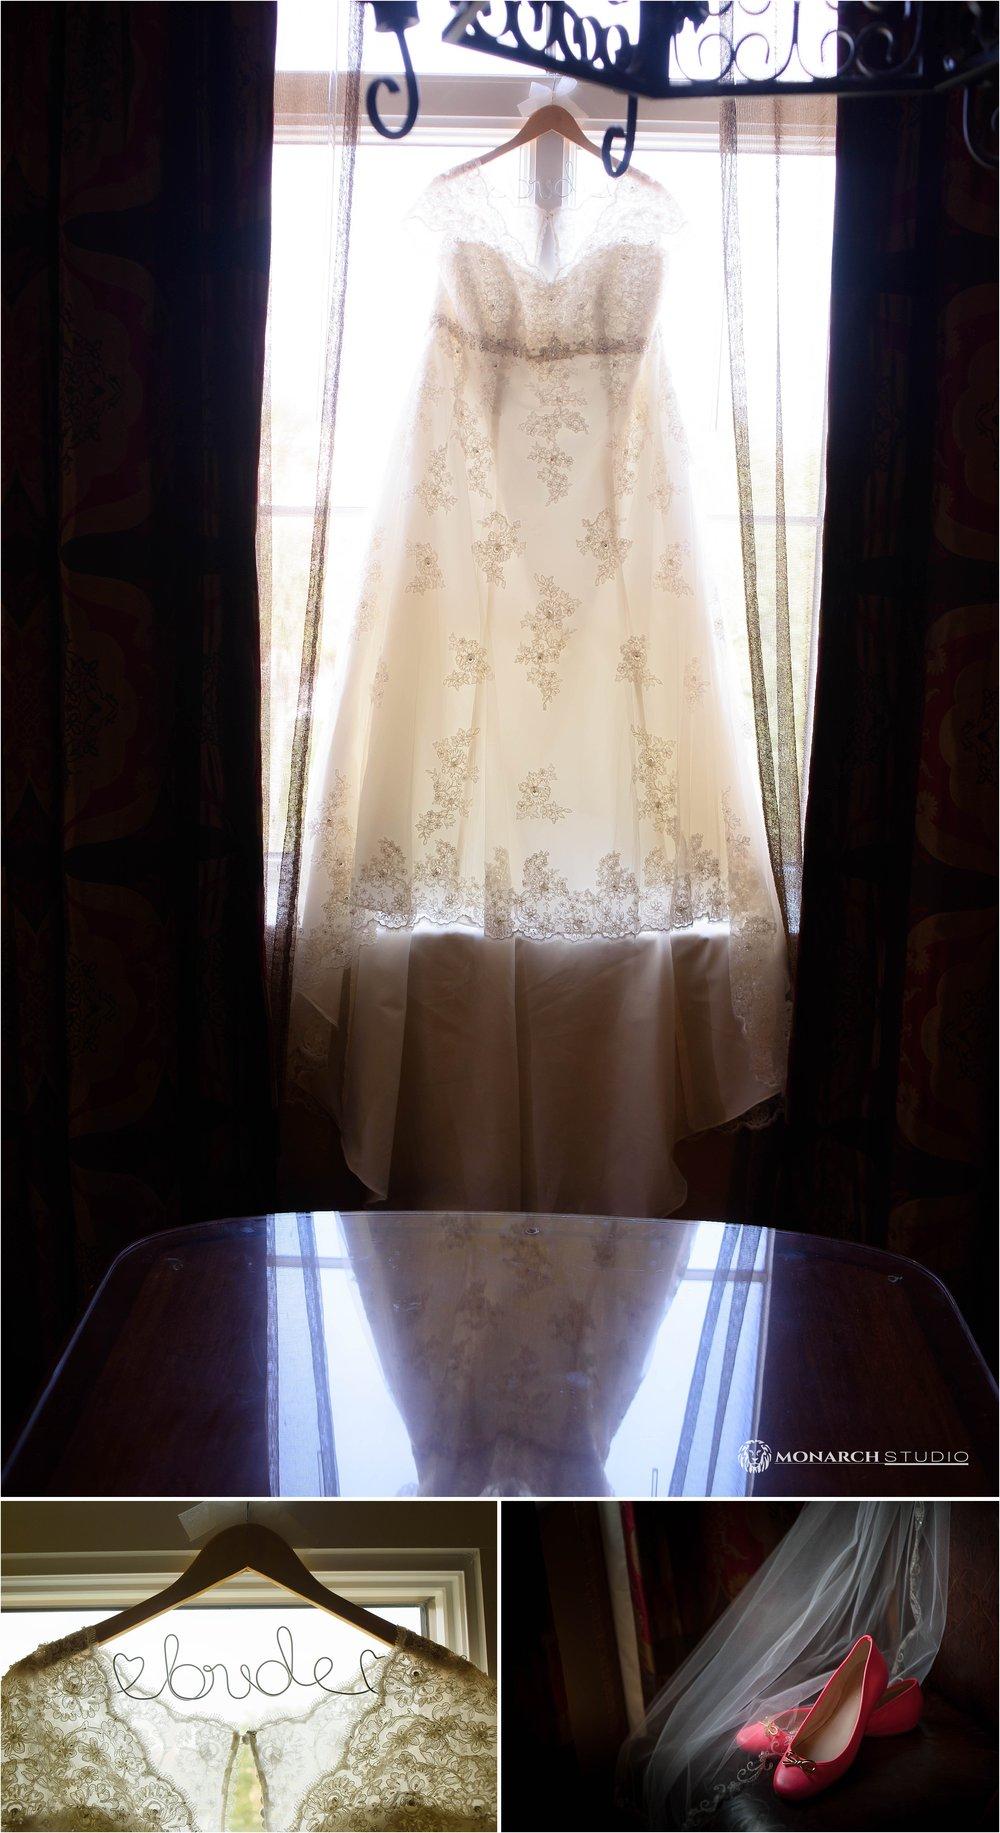 st-augustine-photographer-intimate-wedding-001.jpg